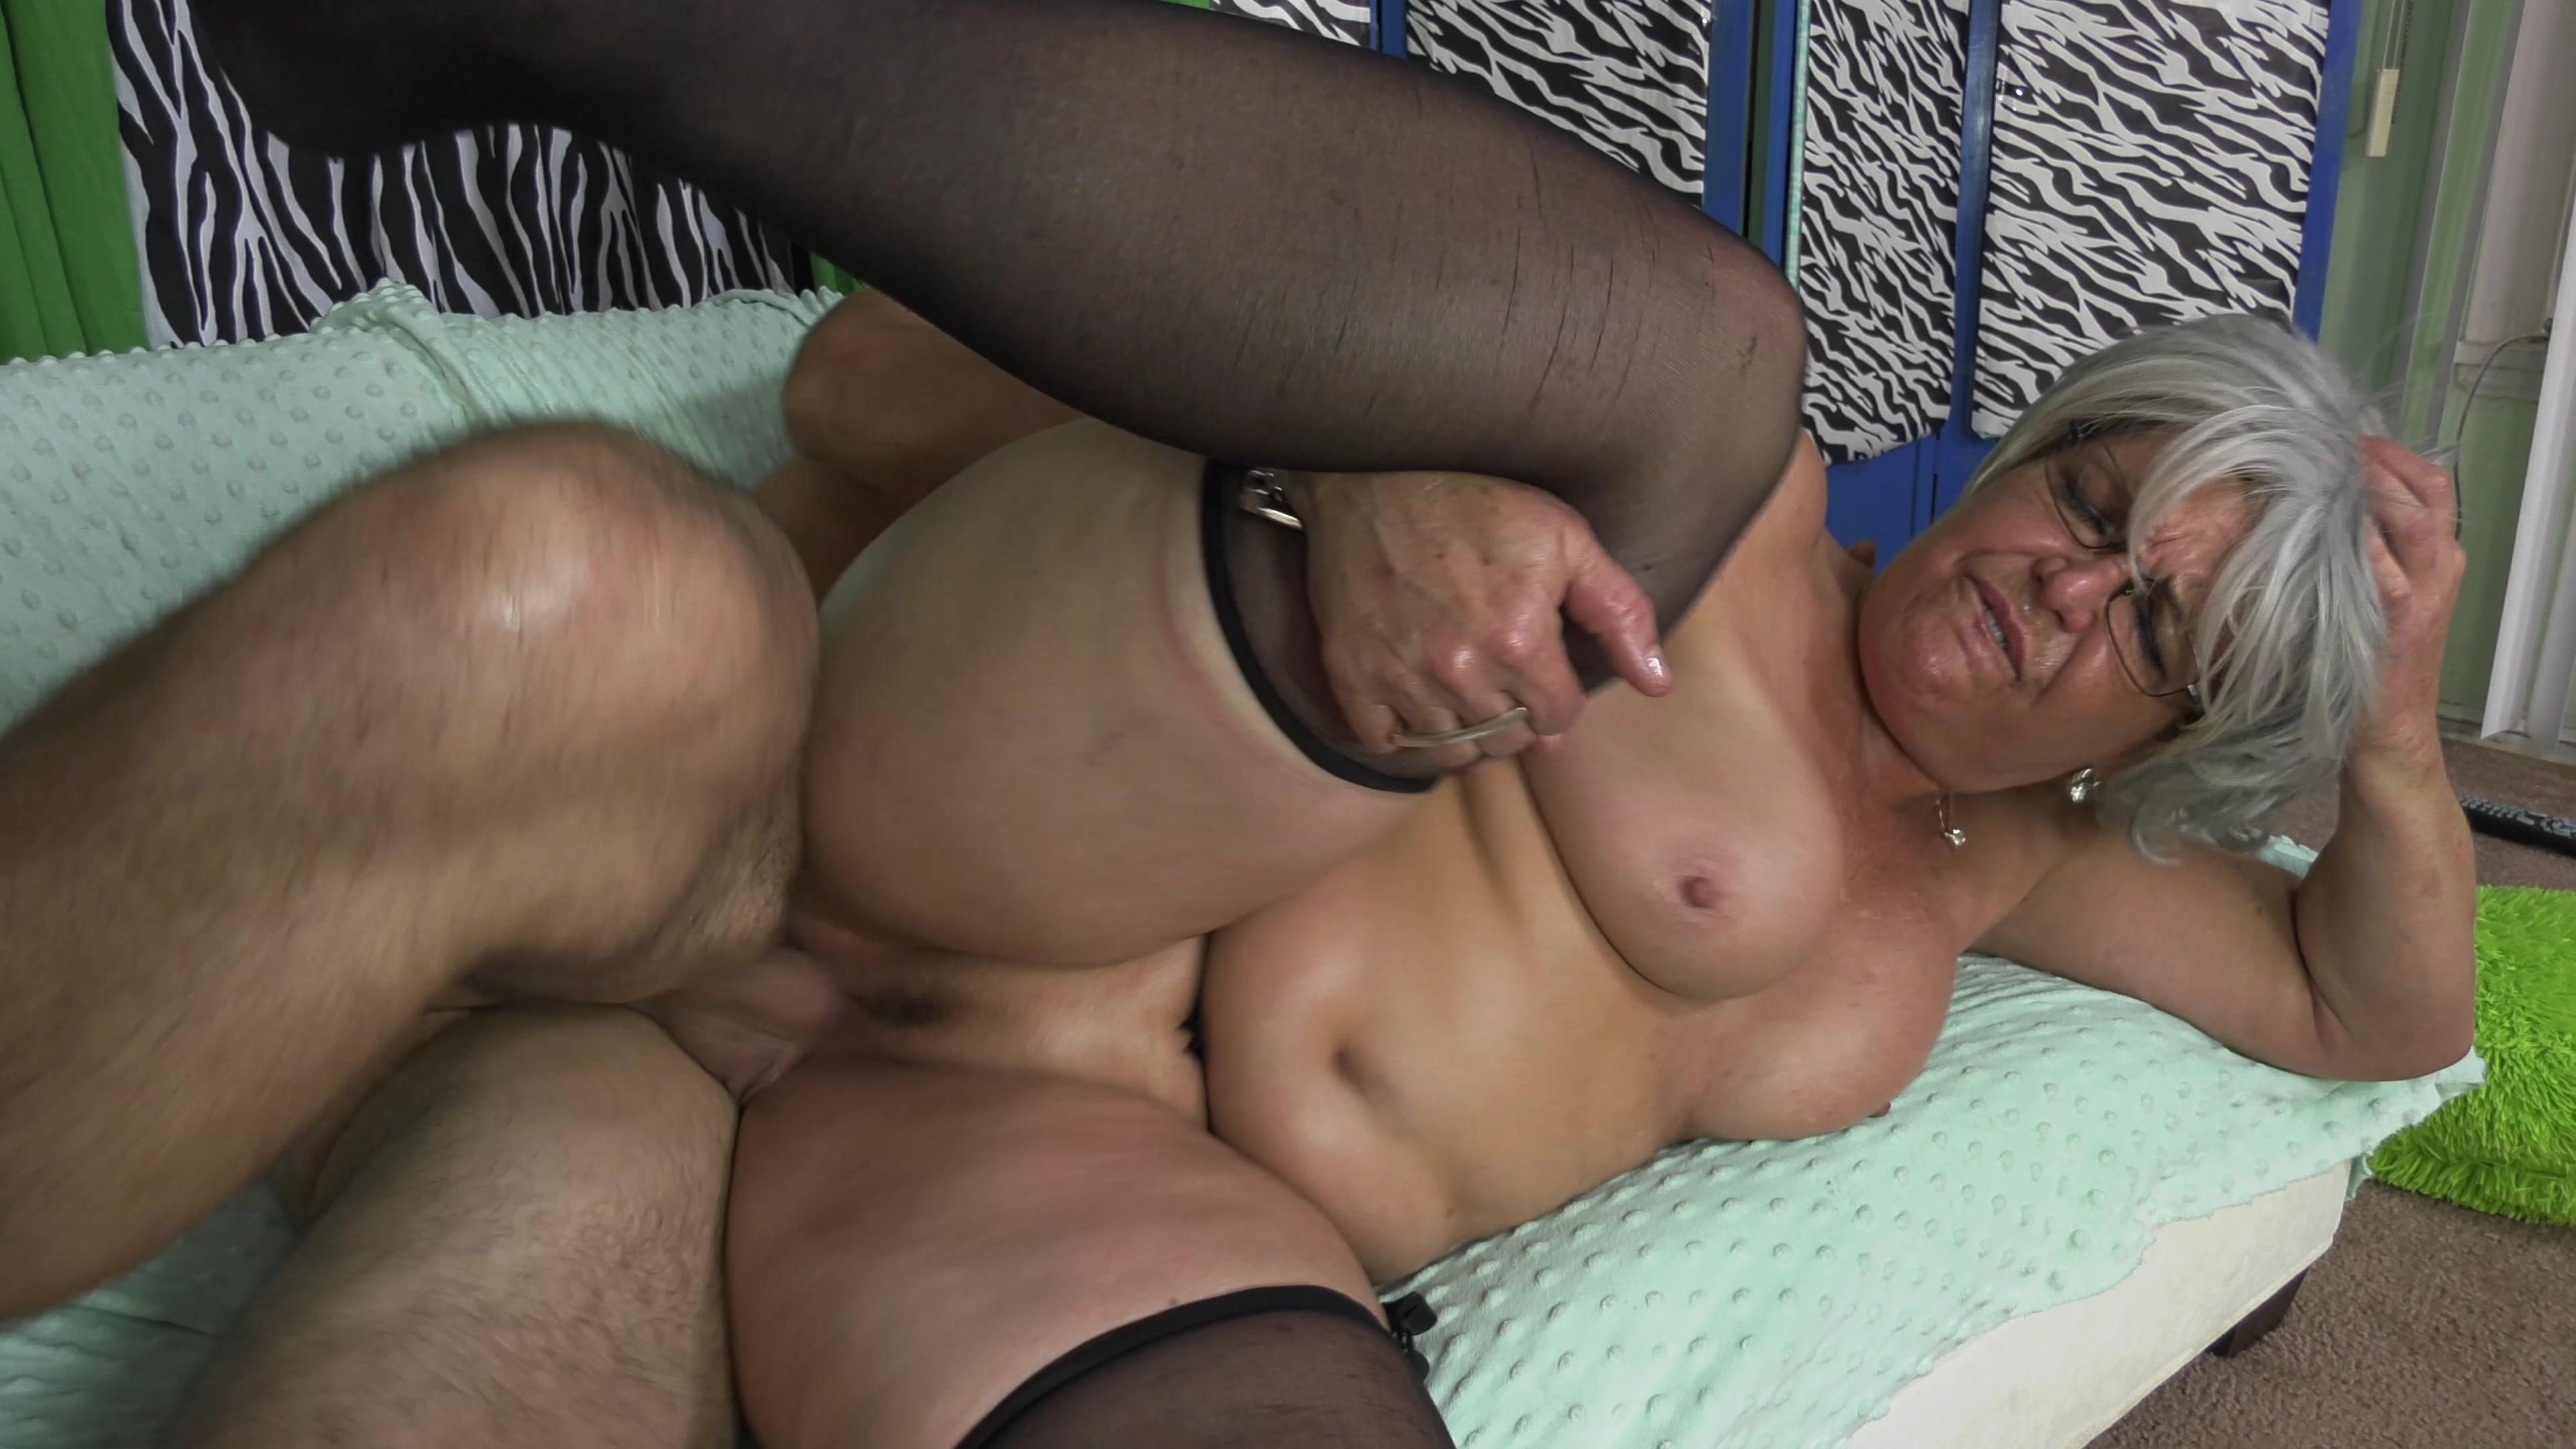 More of me mature milf horny granny horny amateur photos